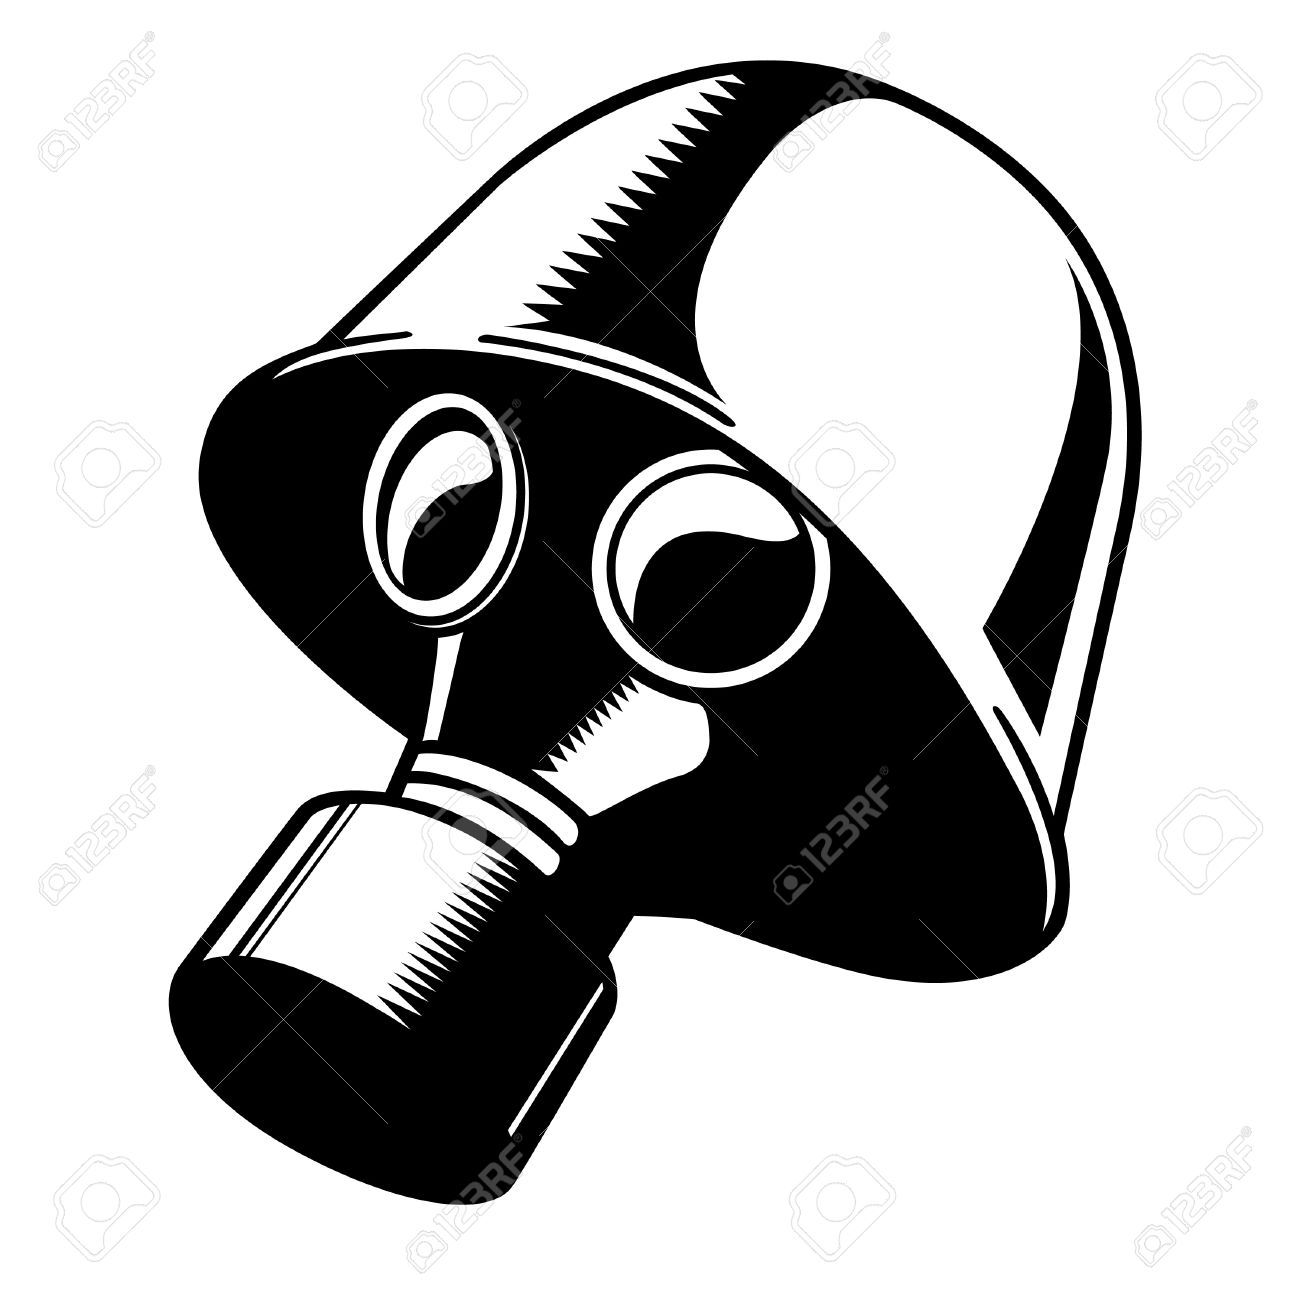 Image result for gas mask cartoon cartoons 4 Pinterest